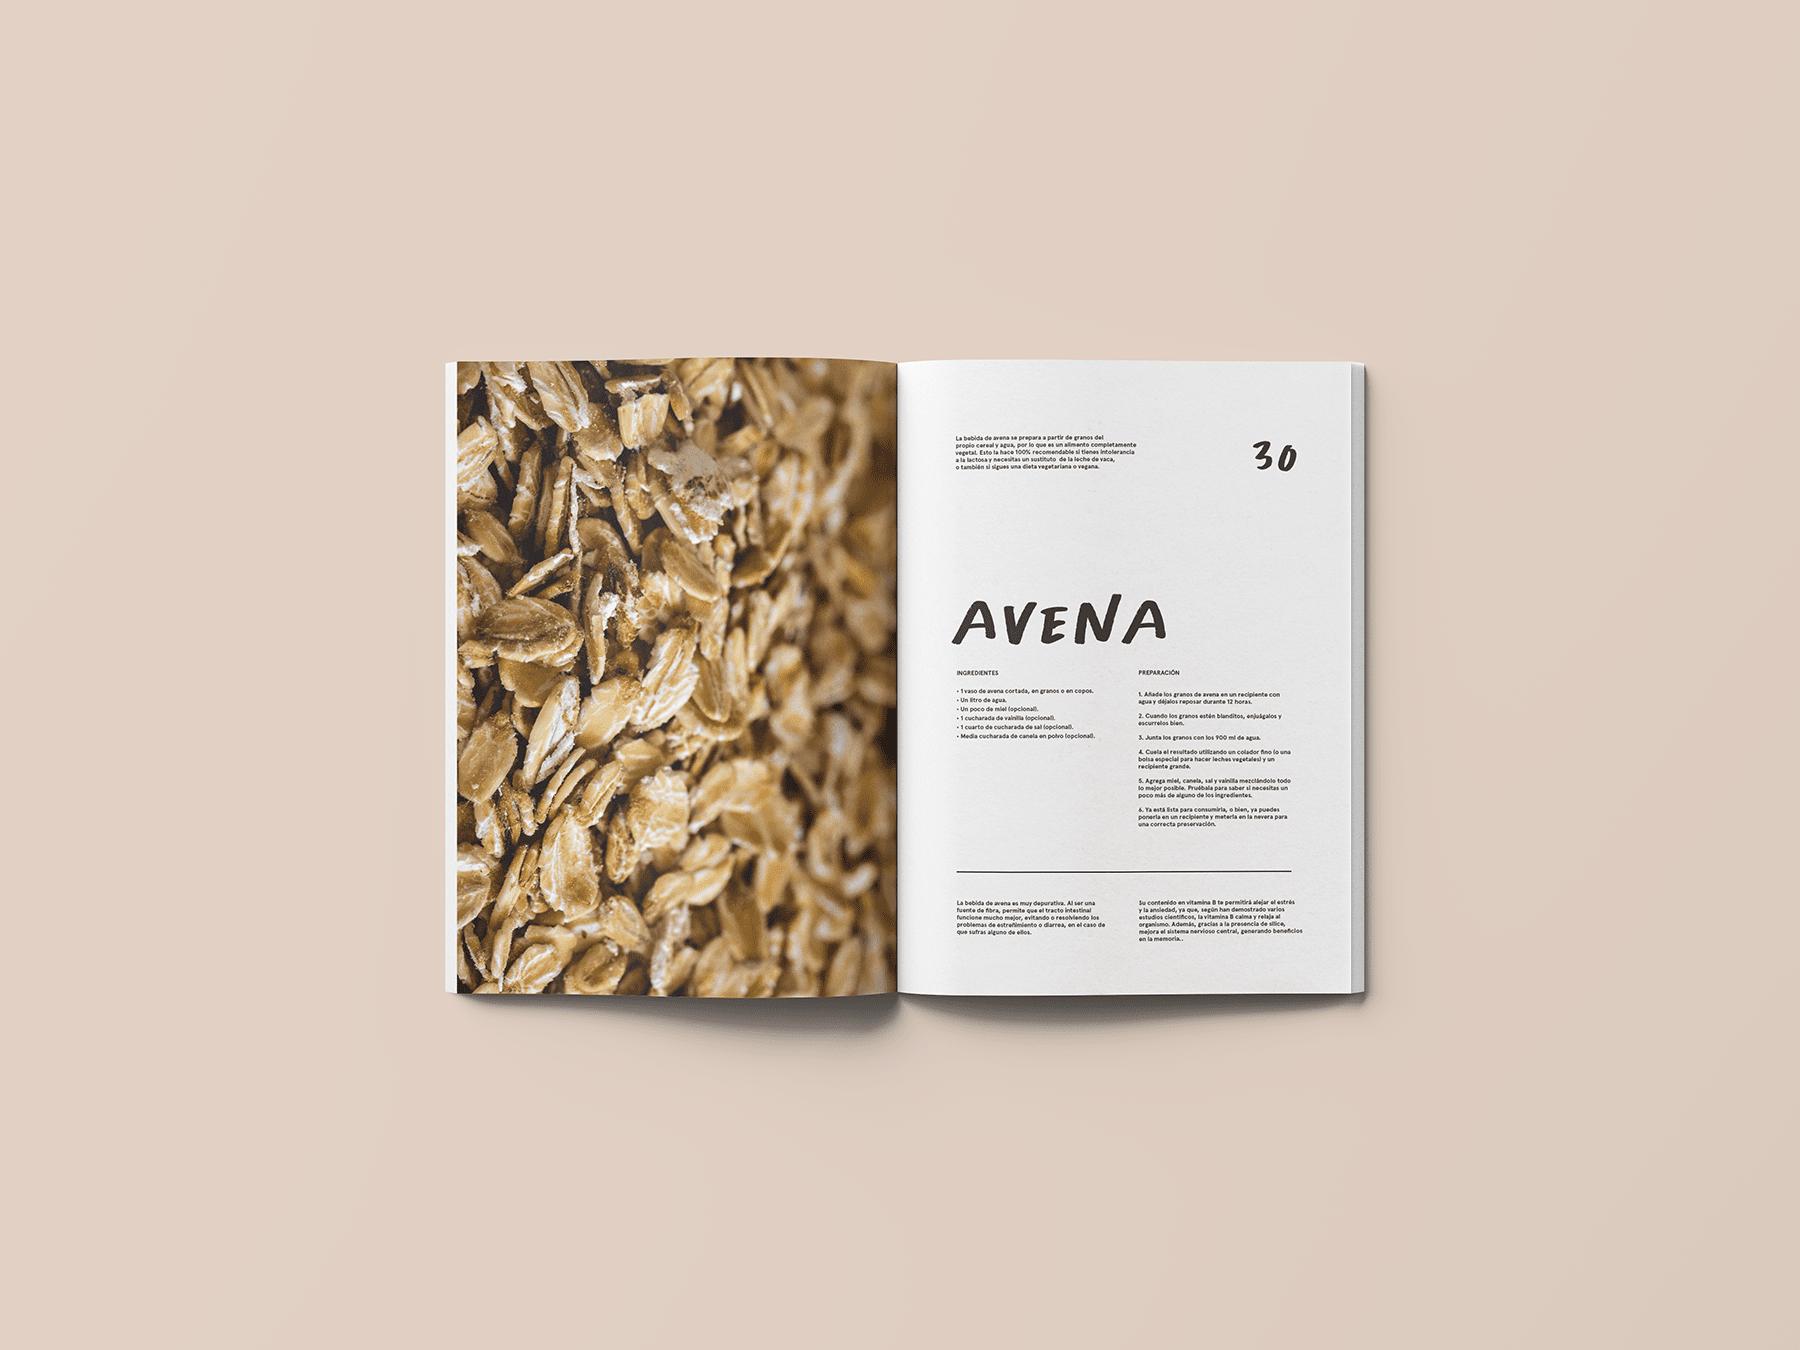 spread-avena-book-lechadas-yoenpaperland